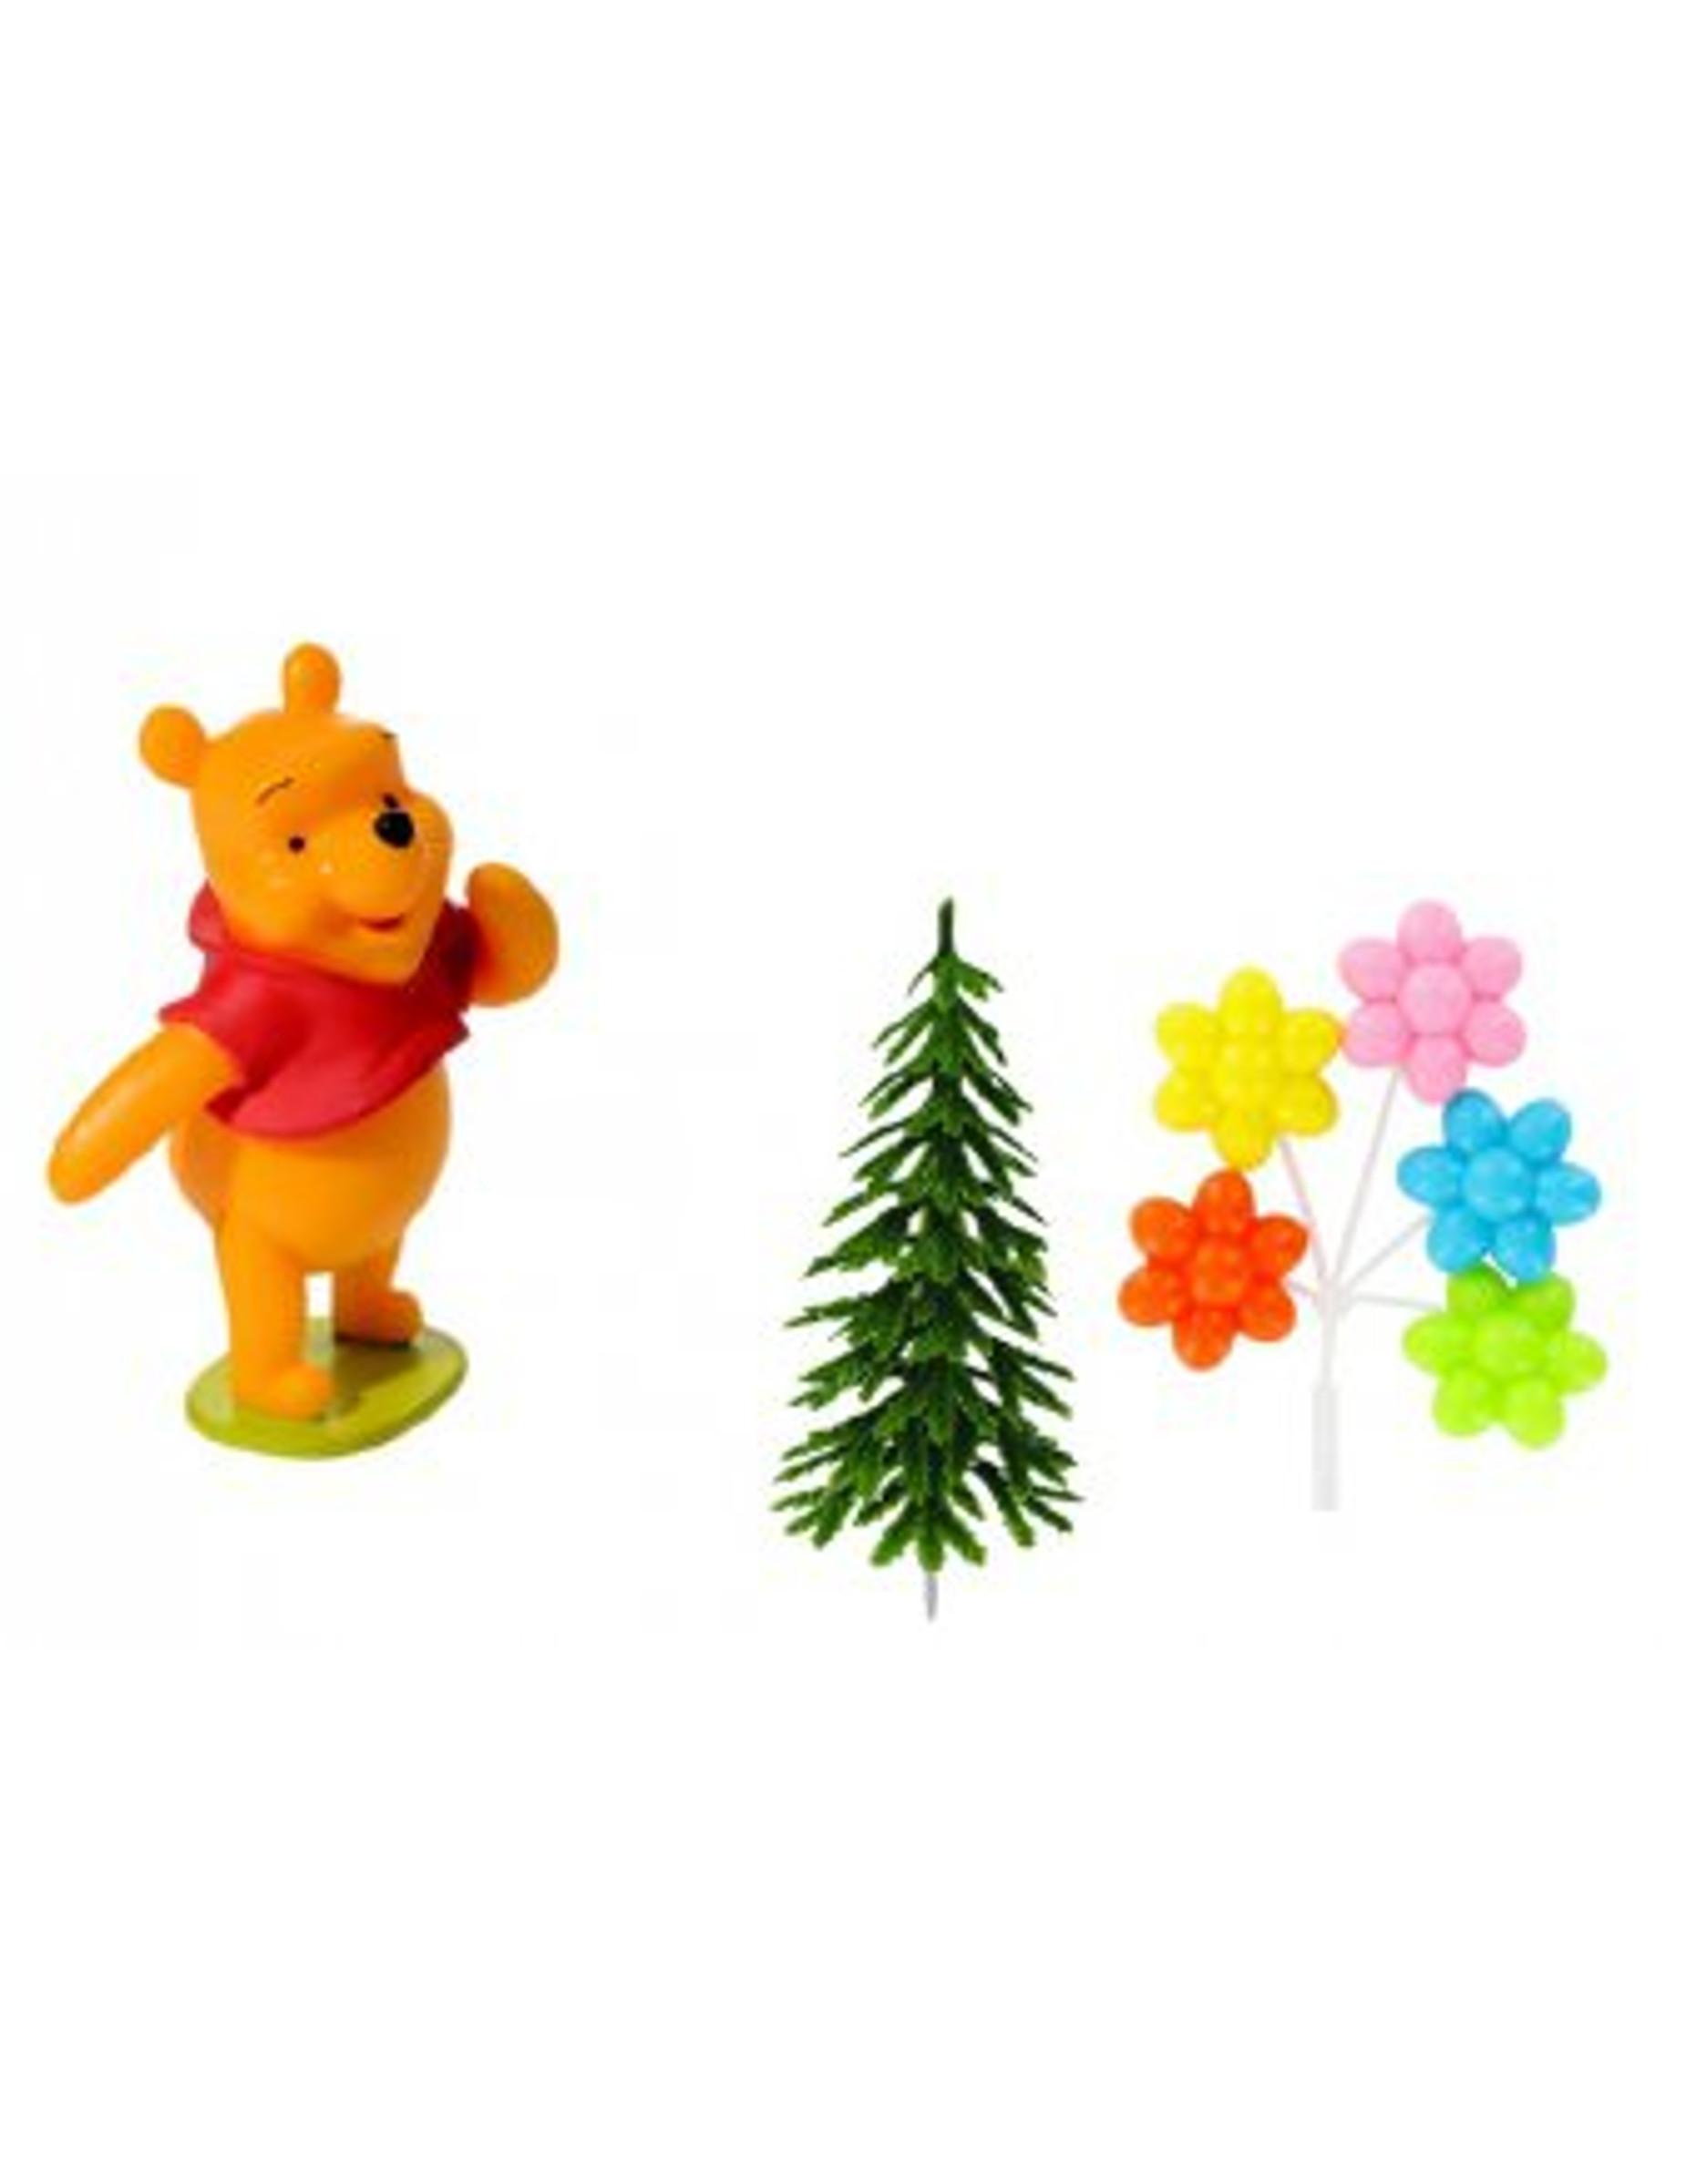 taart accessoires 4 Winnie the Pooh™ taart accessoires: Decoratie,en goedkope  taart accessoires